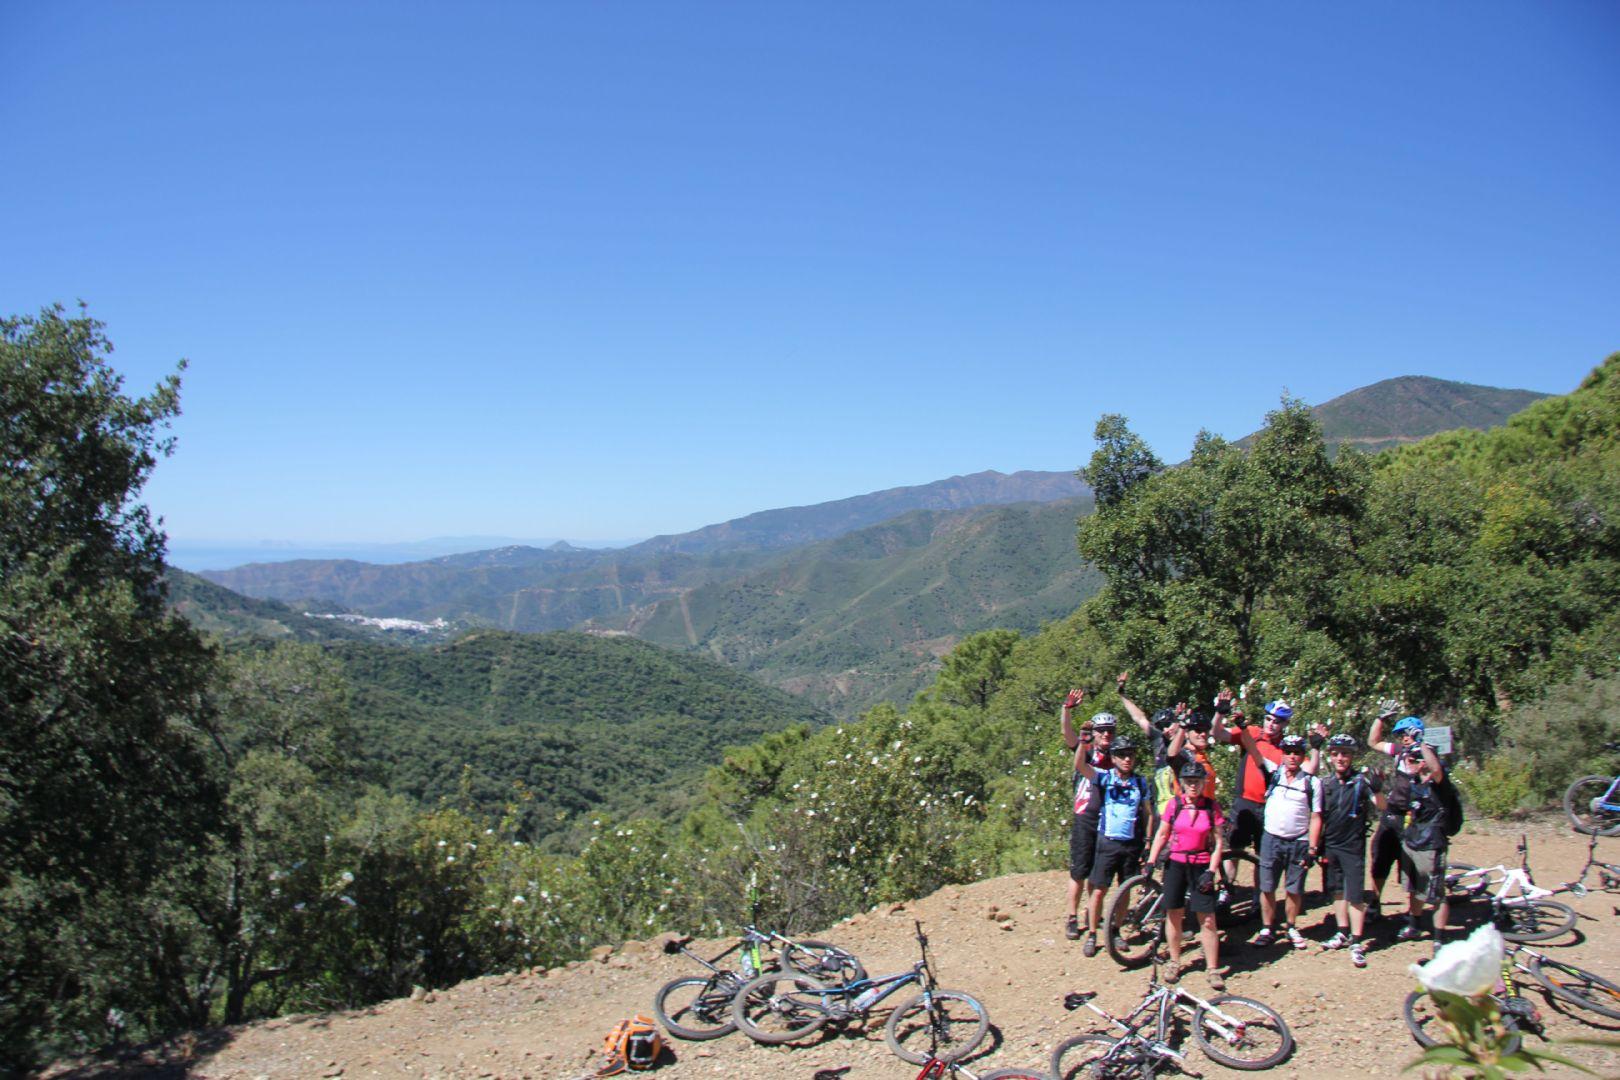 IMG_9062.JPG - Spain - Trans Andaluz - Guided Mountain Bike Holiday - Mountain Biking